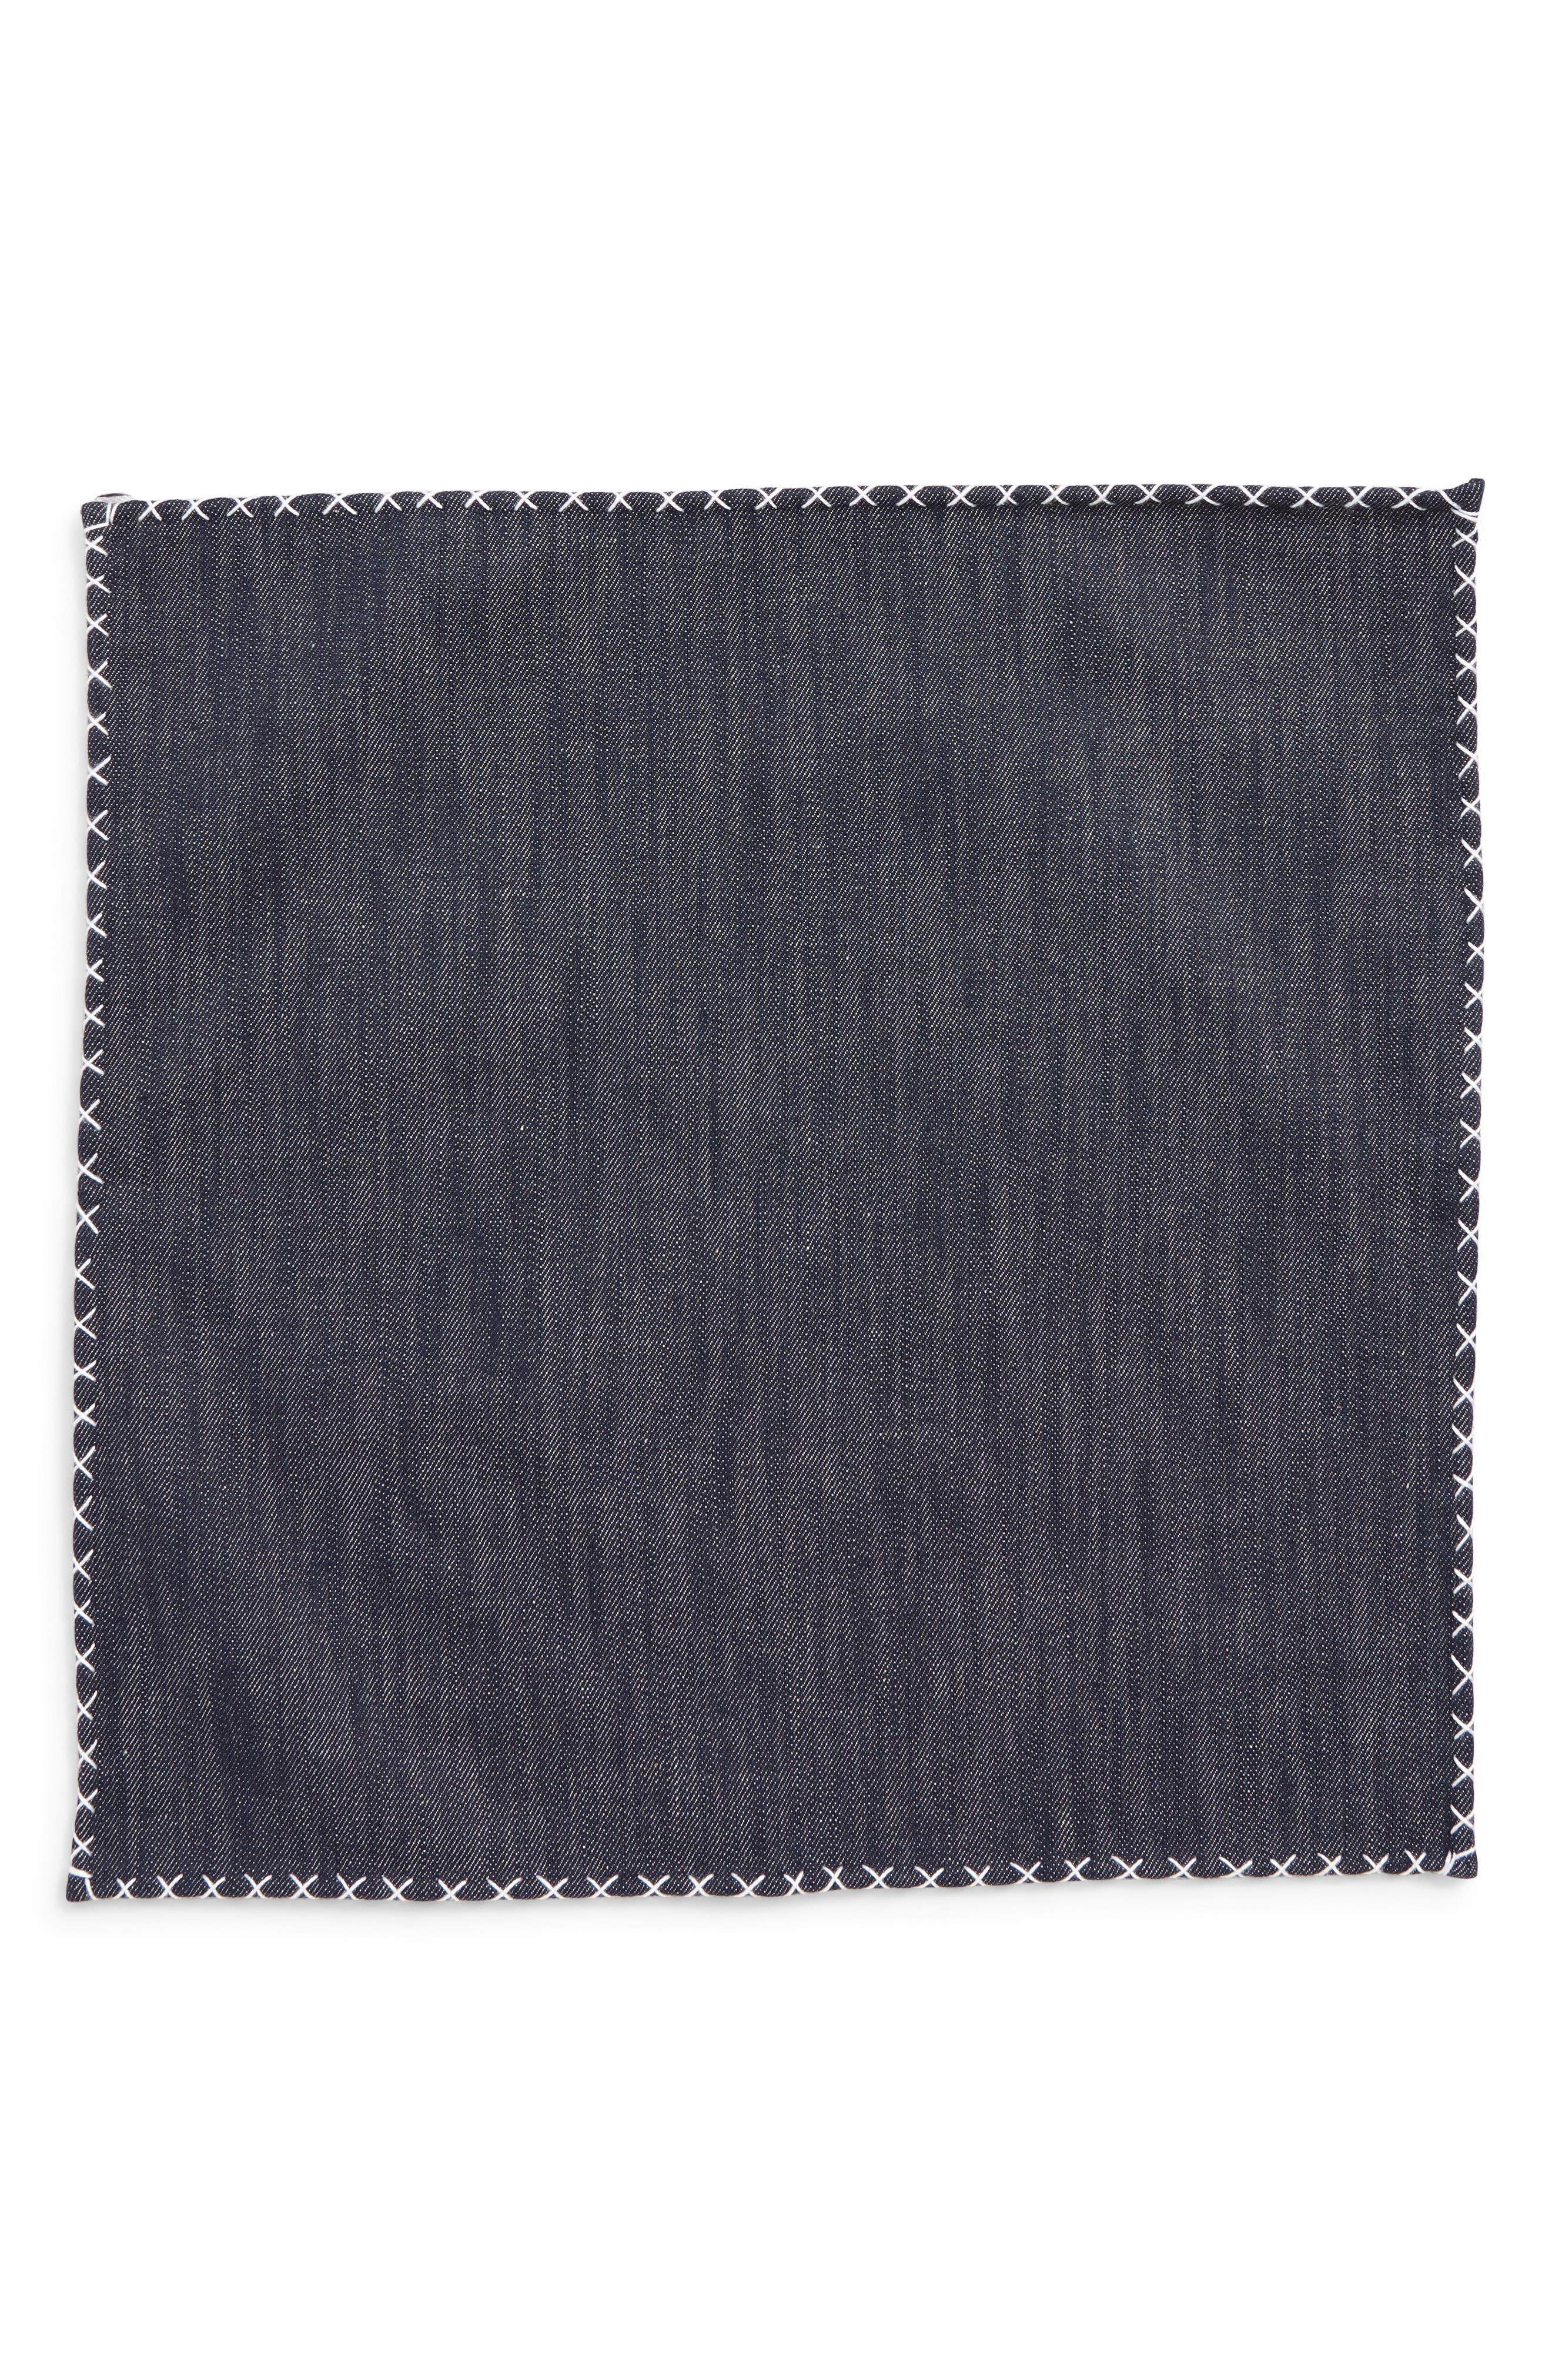 ELEVENTY, Denim Cotton Pocket Square, Alternate thumbnail 2, color, DENIM/ WHITE